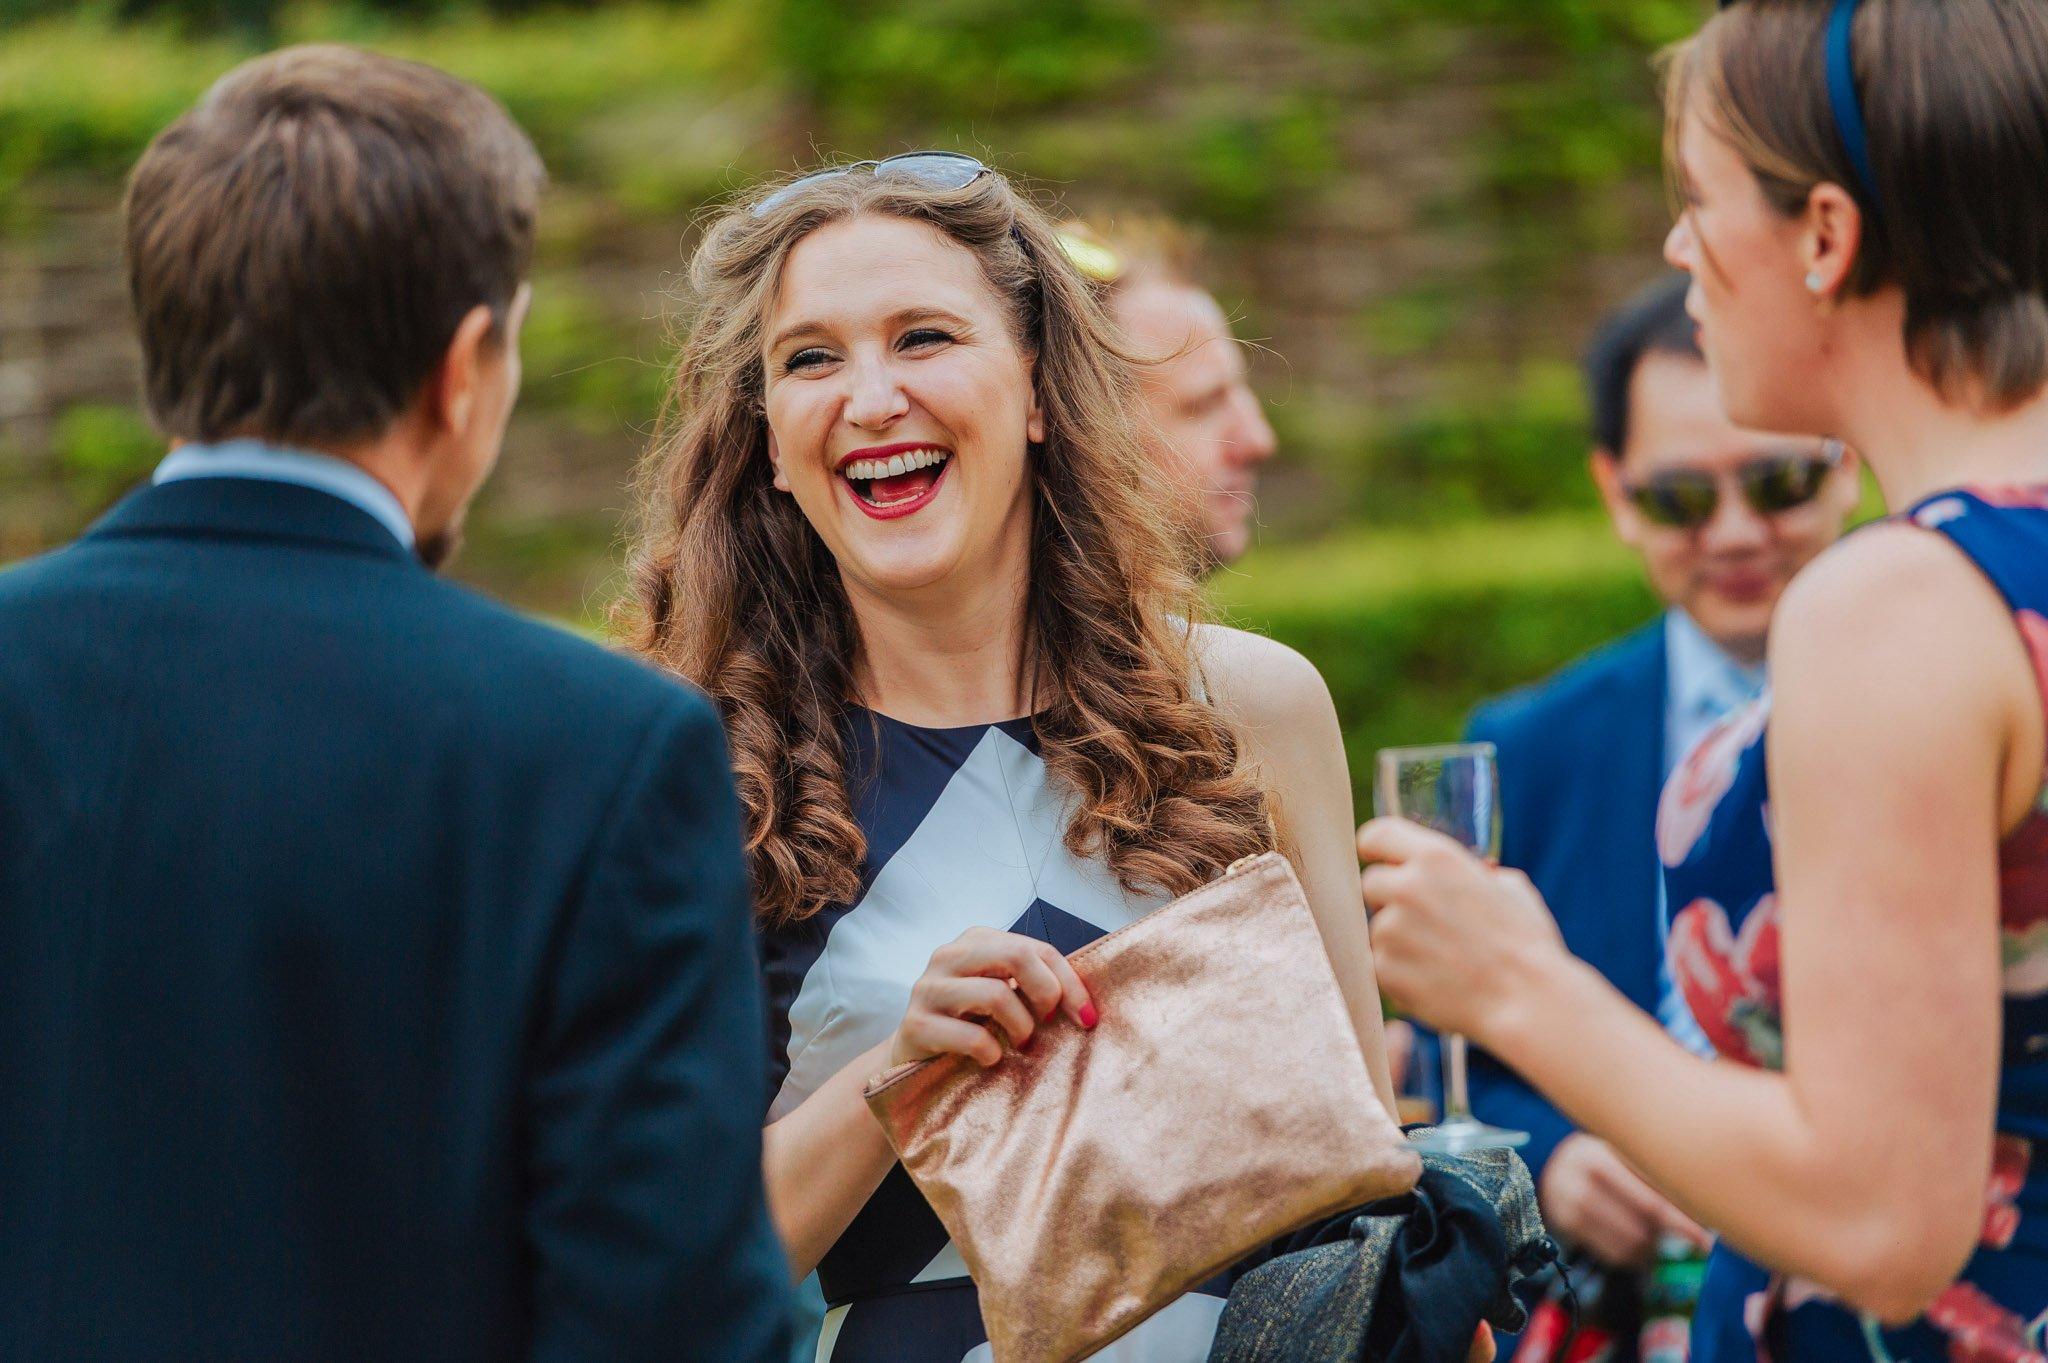 Georgina + Mike - Wedding photography in Malvern, Worcestershire 38